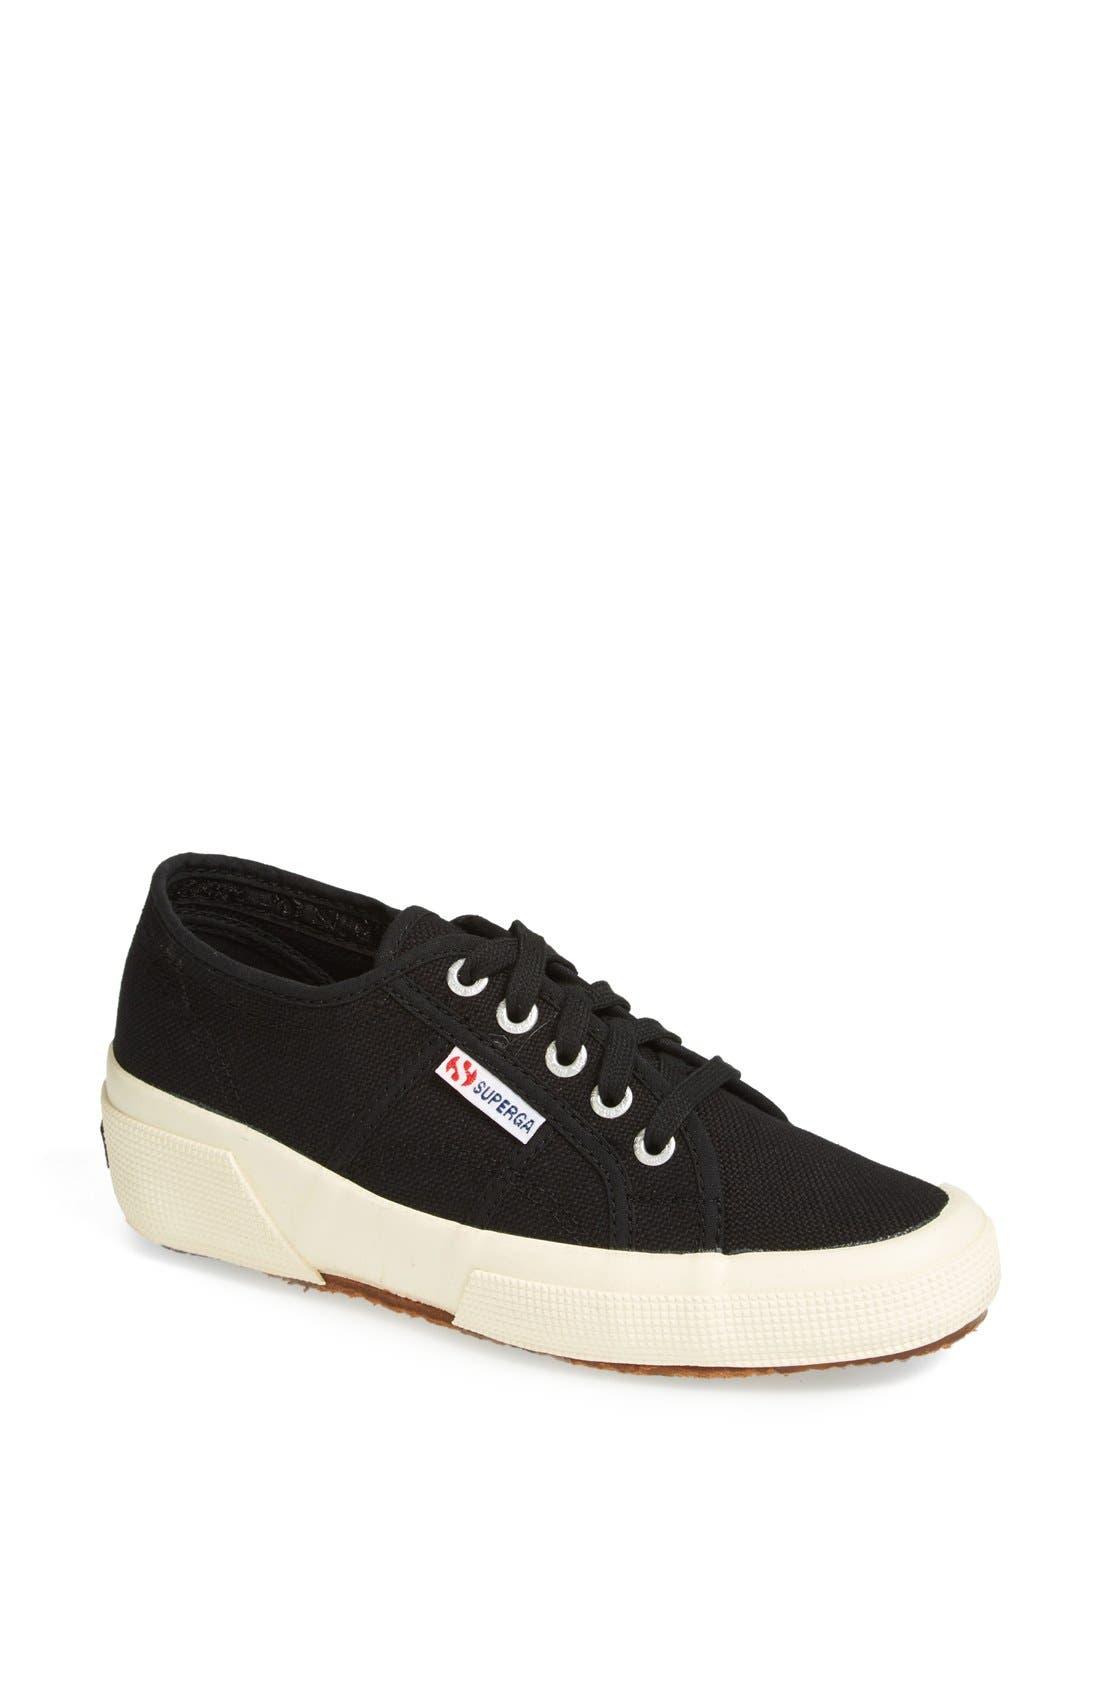 Main Image - Superga 'Linea' Wedge Sneaker (Women)